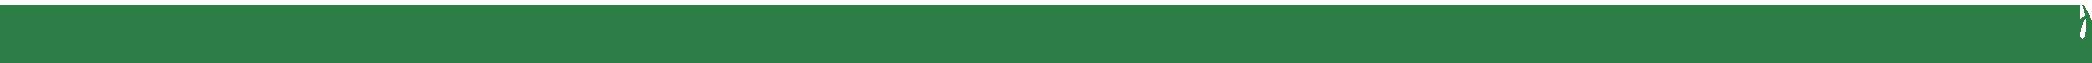 jardiservice-erba-verde